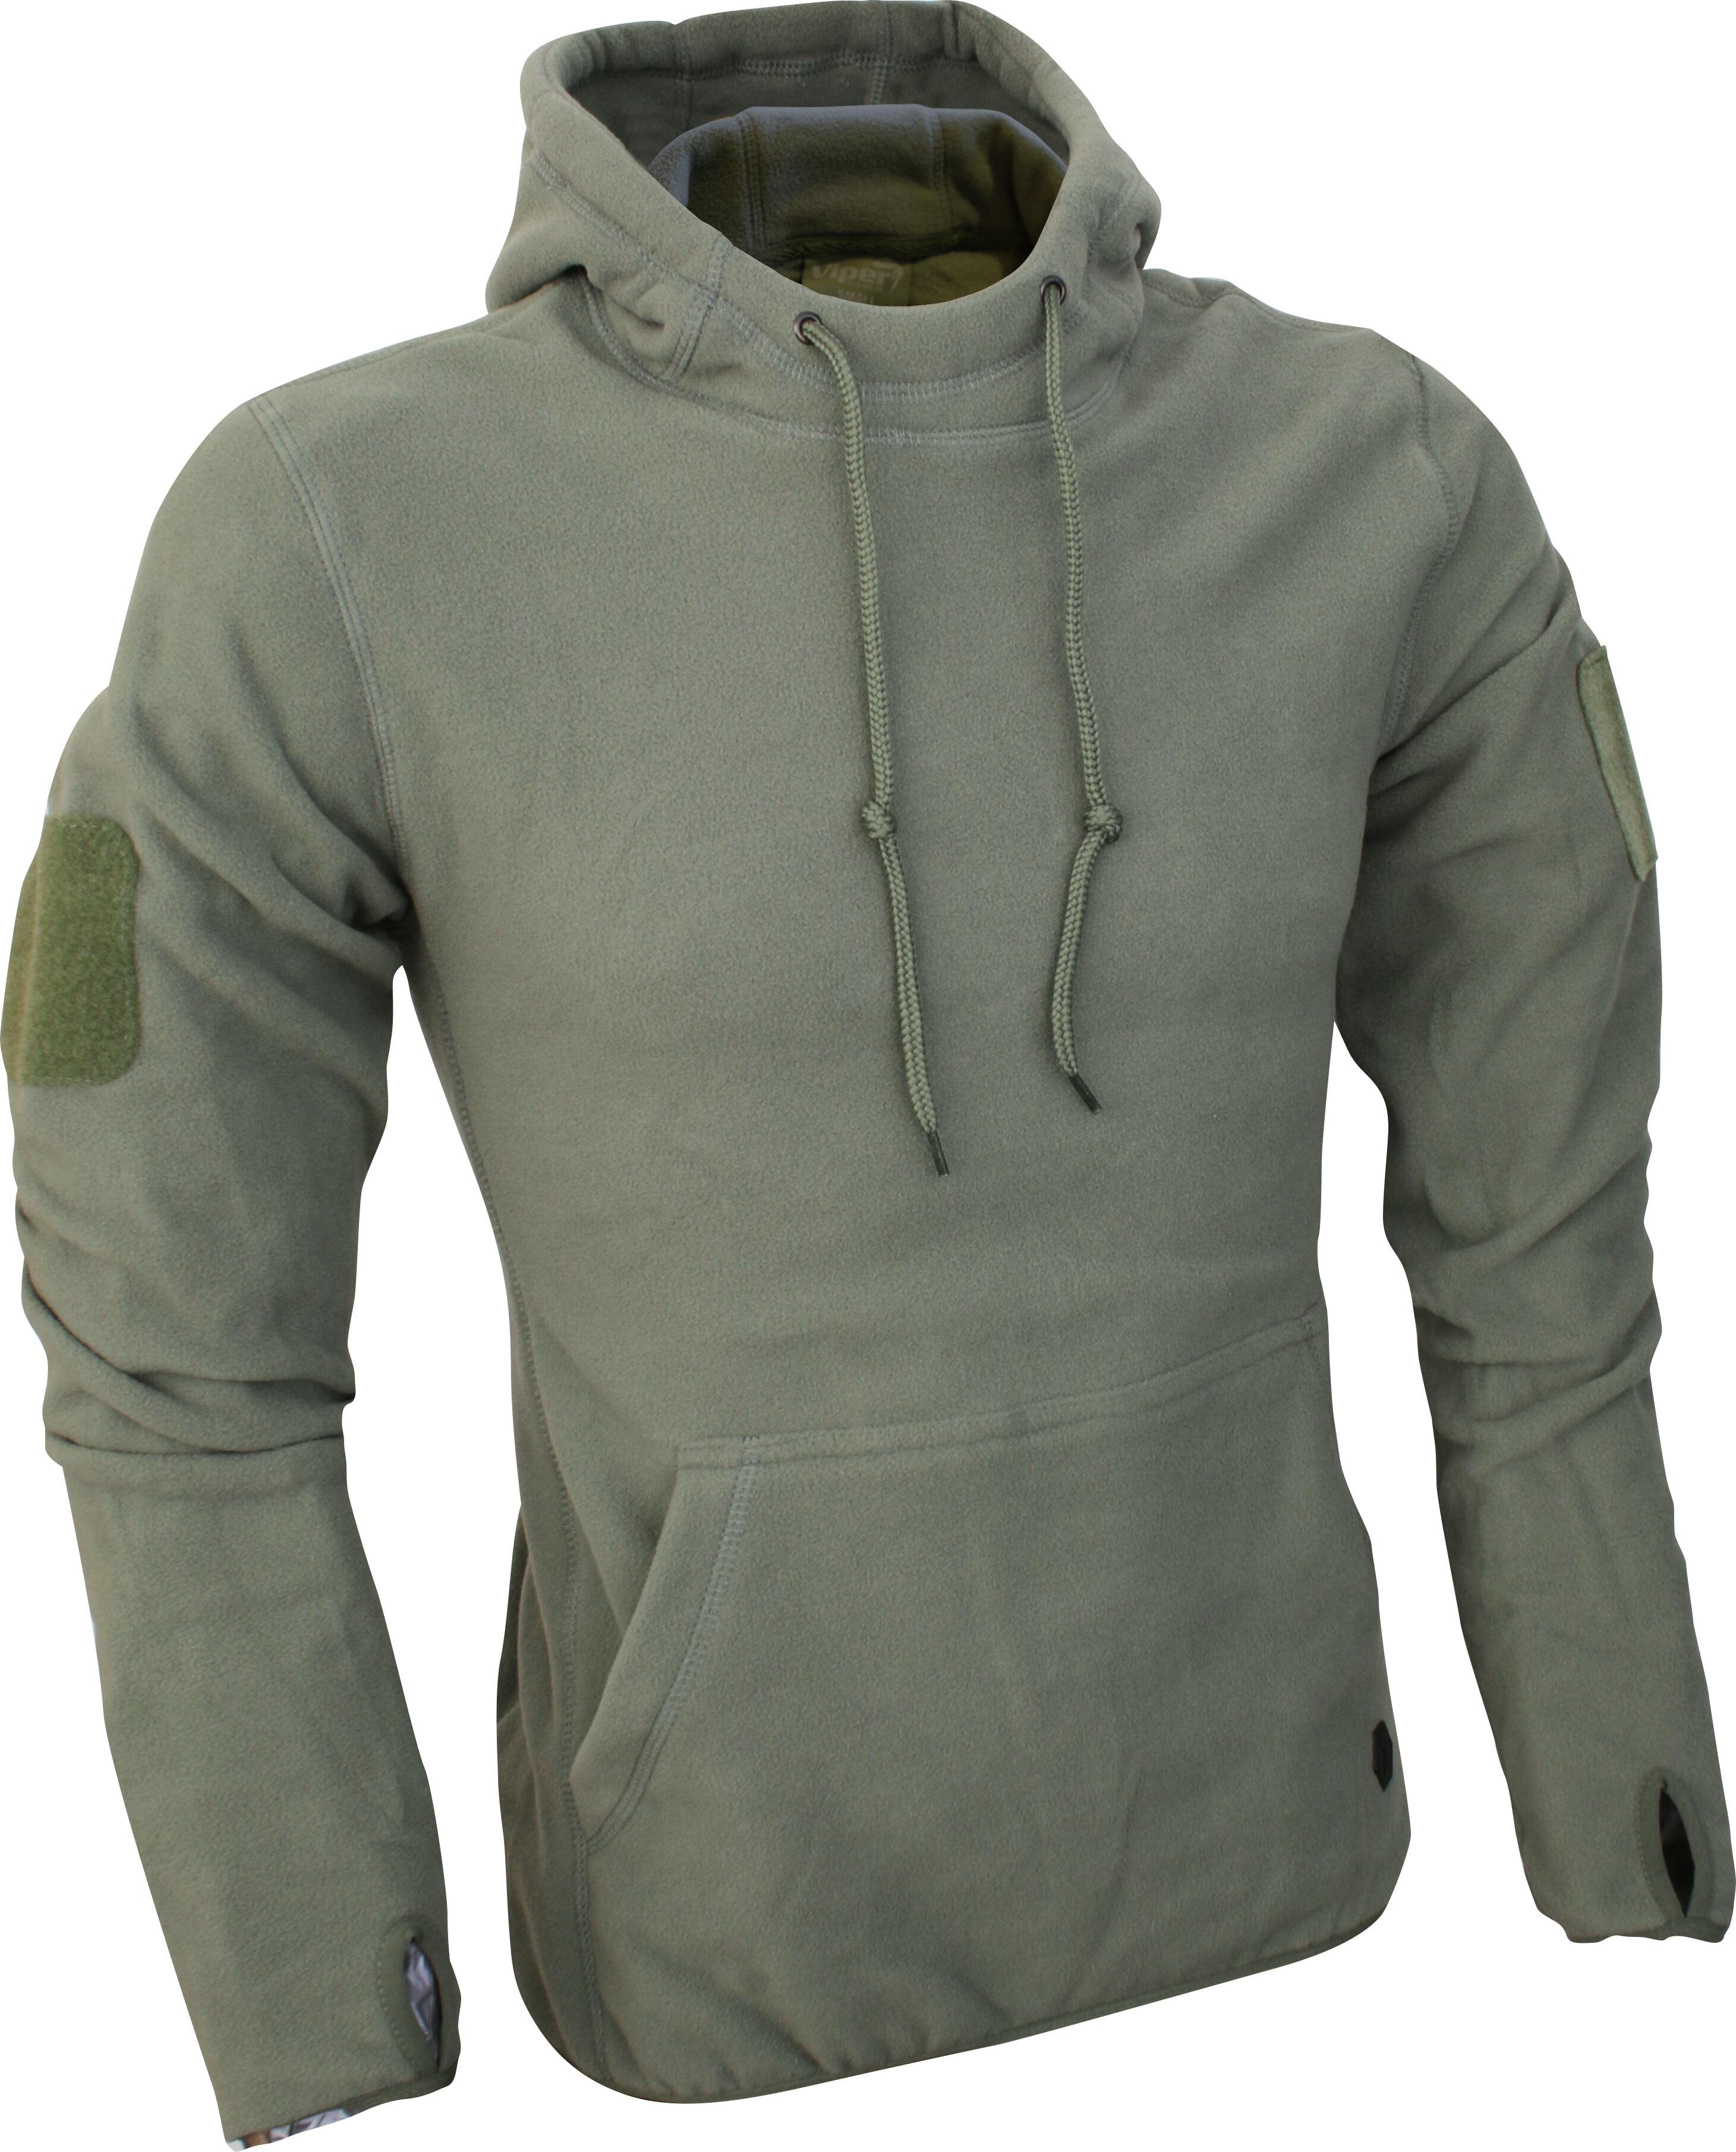 Viper Tactical Zipped Fleece Hoodie Green XX-Large